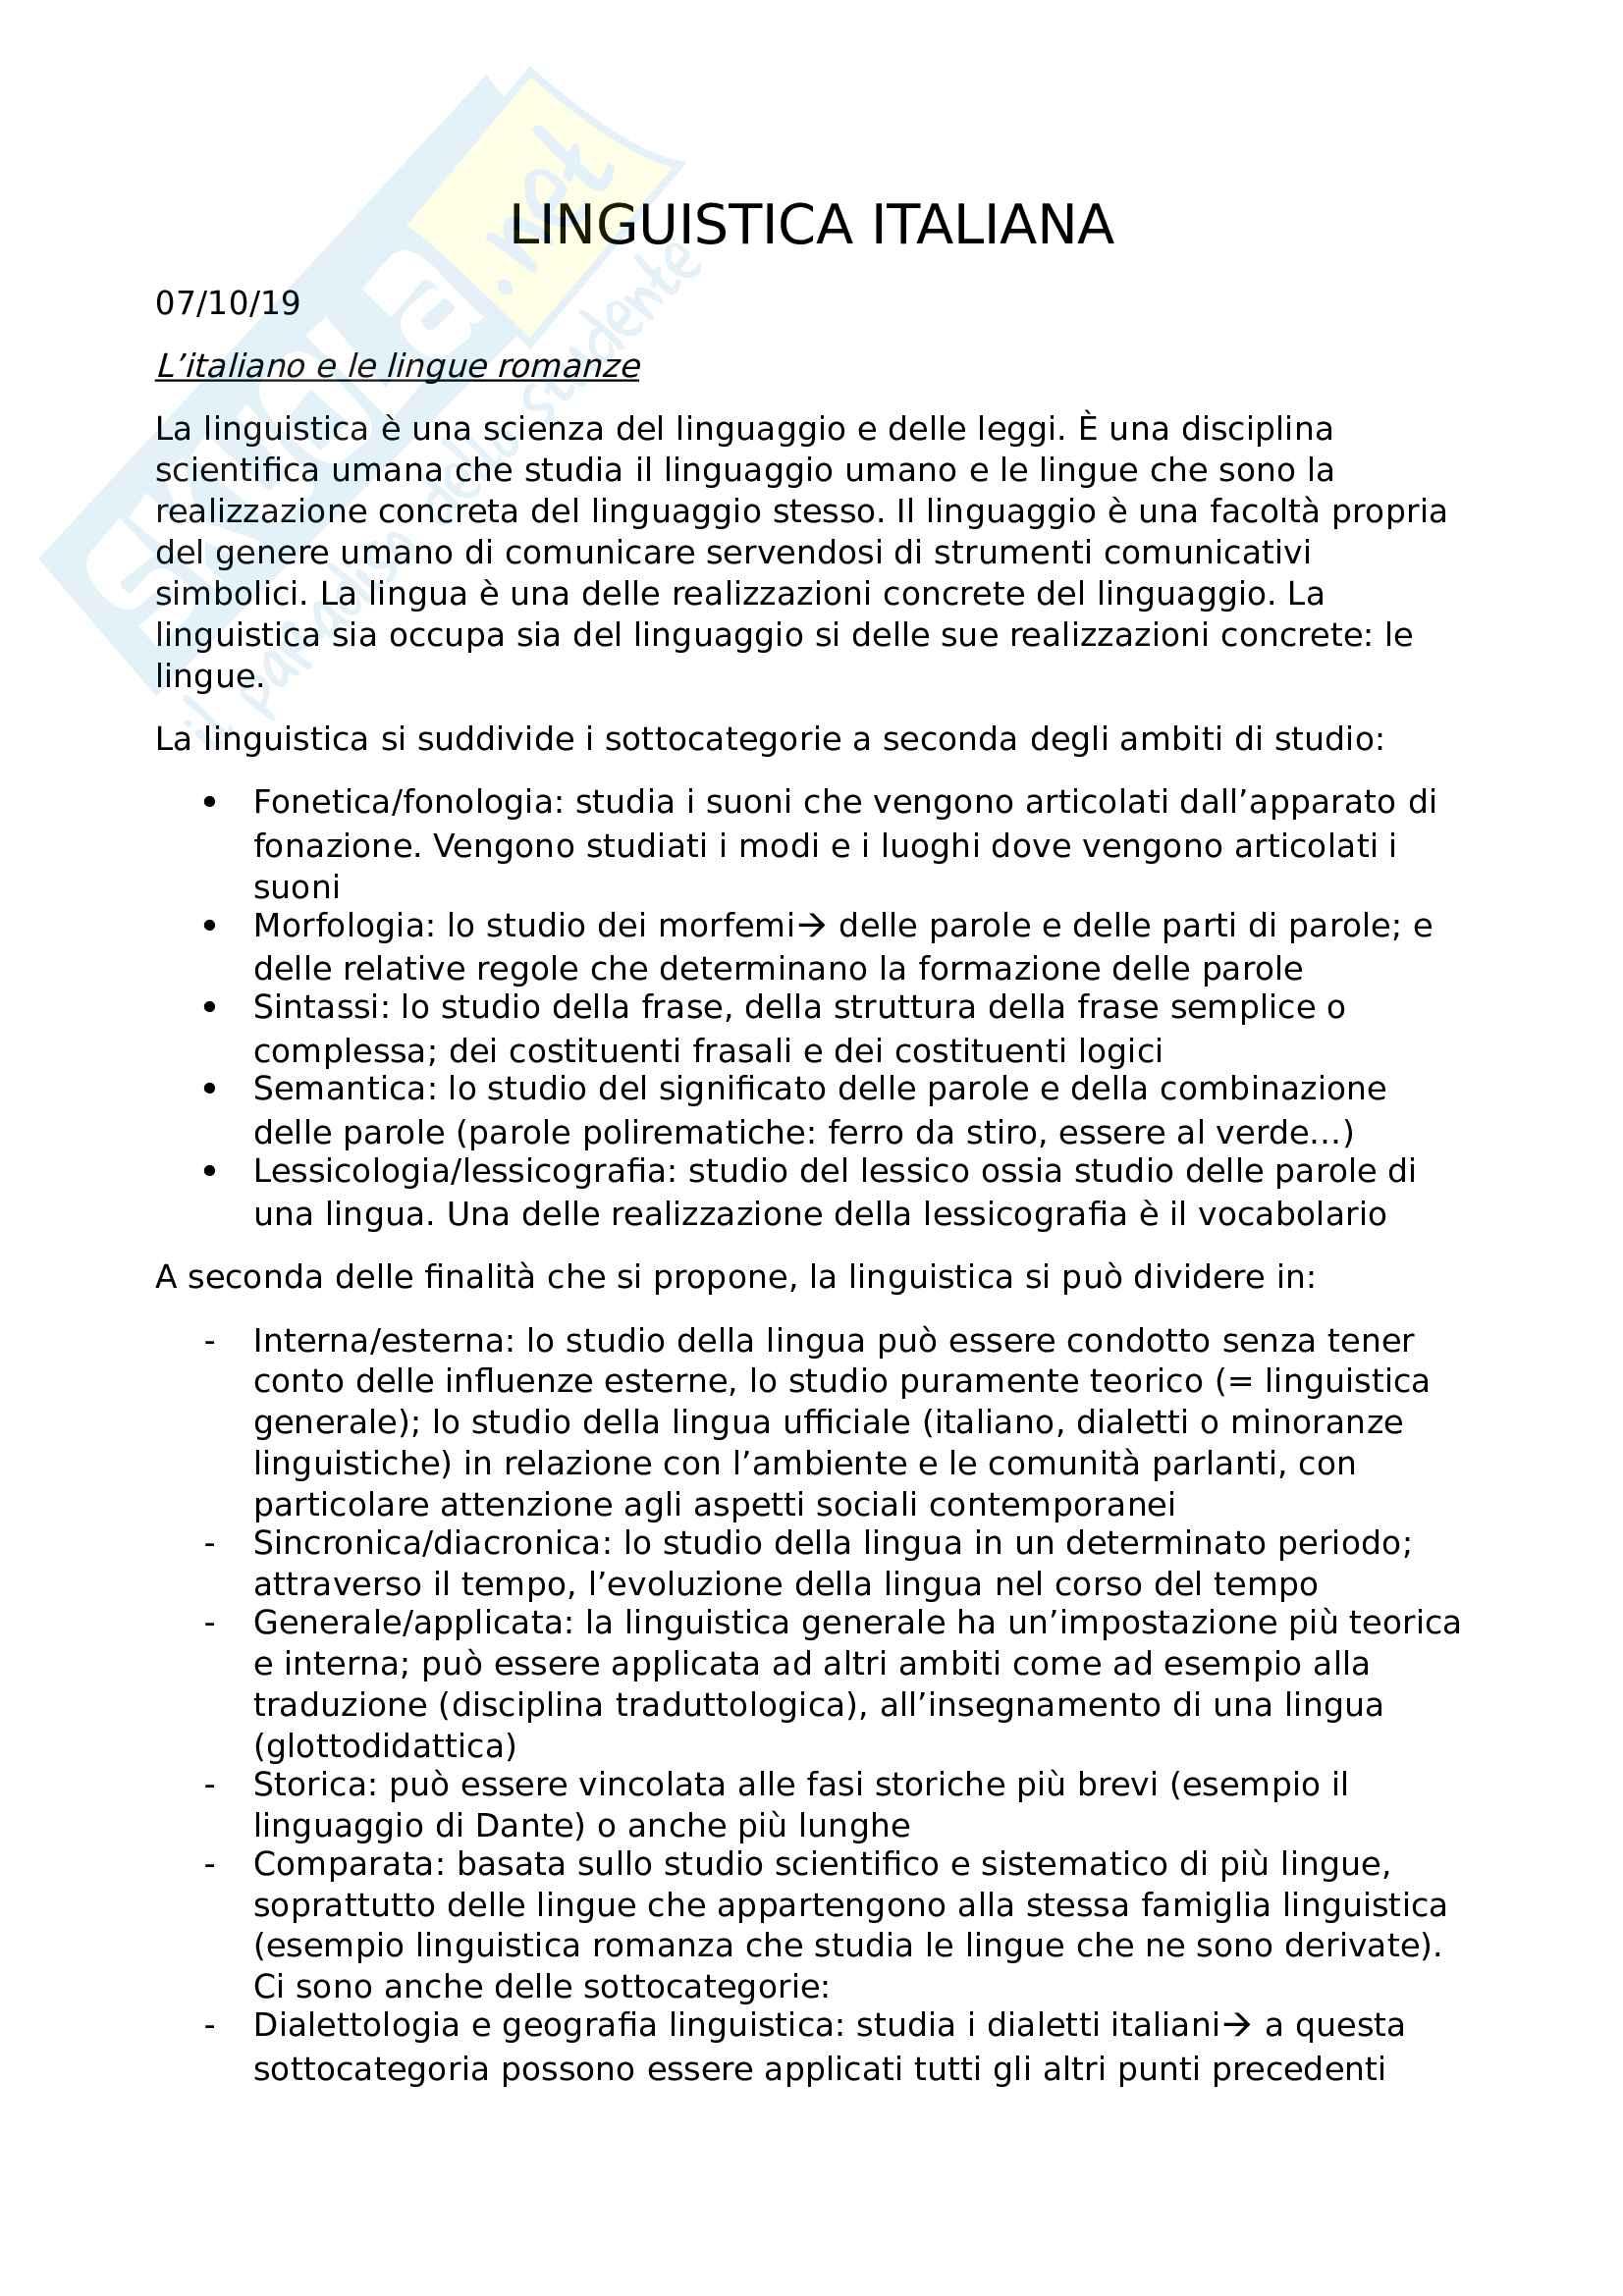 Linguistica Italiana - prof Luca Bellone